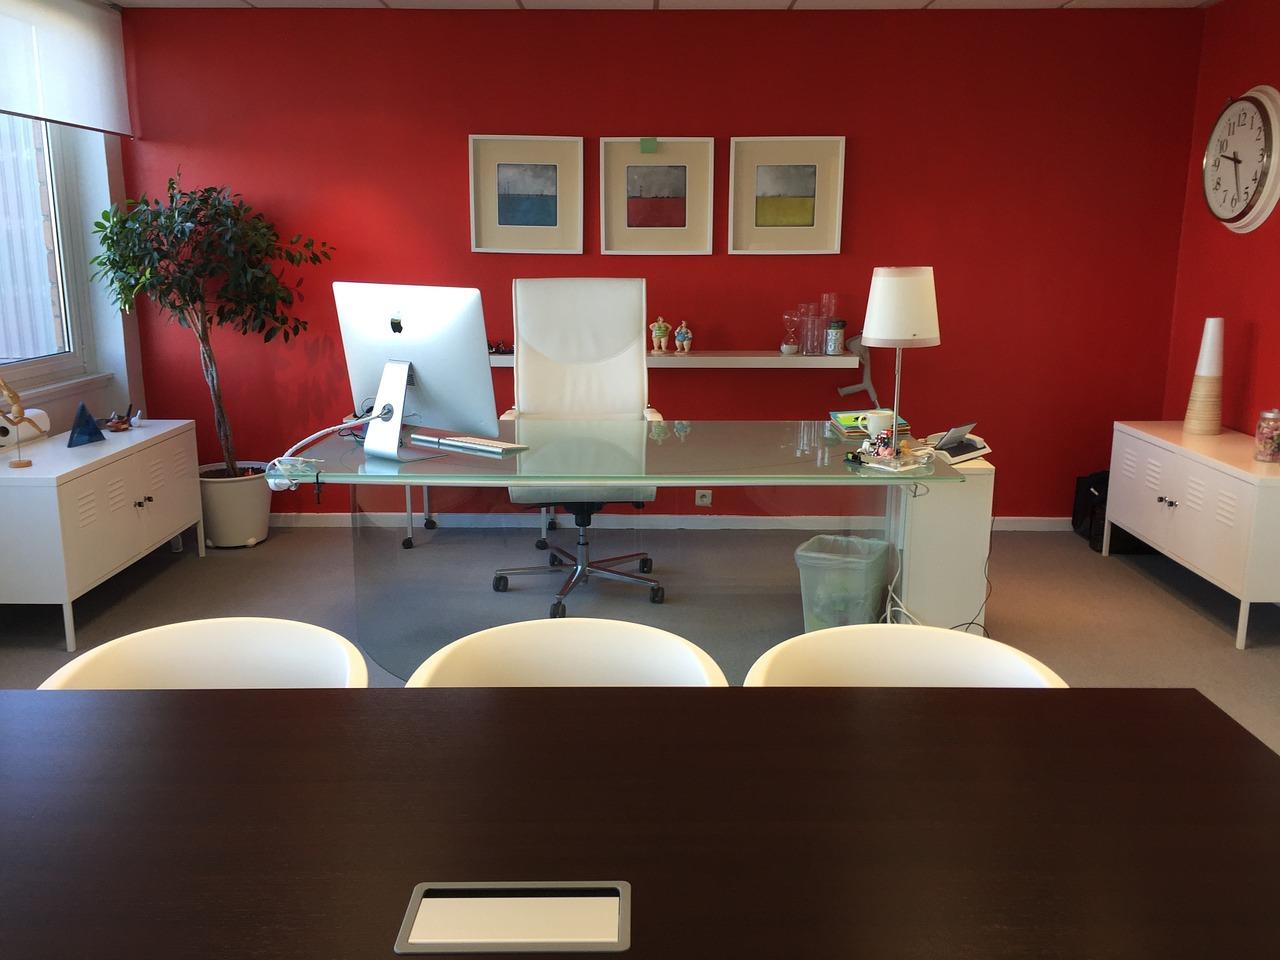 office-1177468_1280